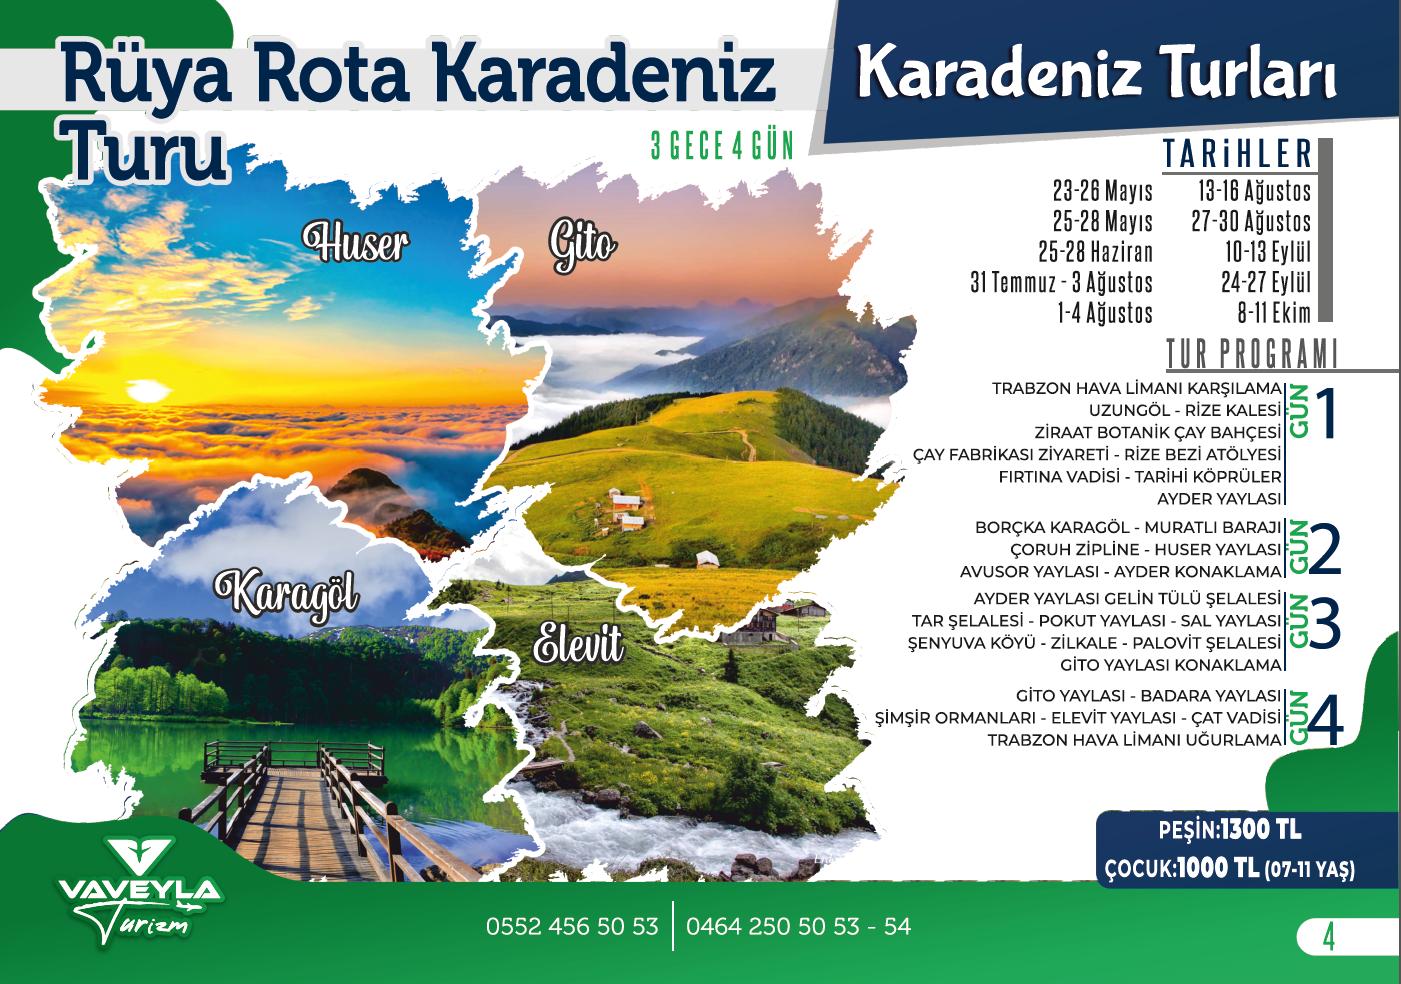 Rüya Rota Karadeniz Turu